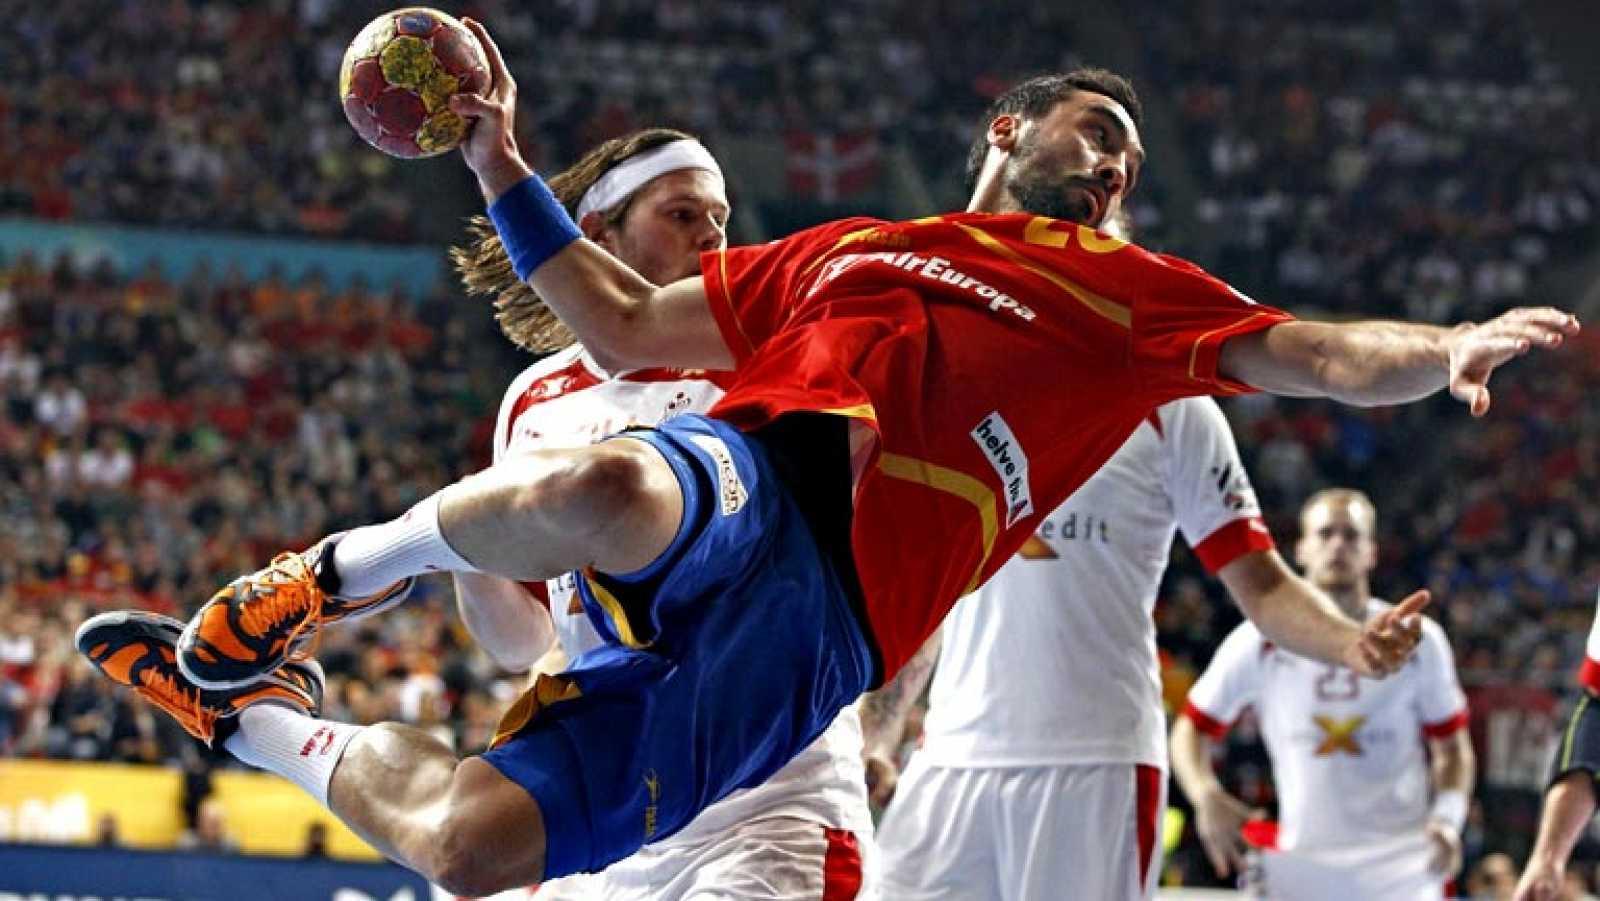 Mundial de Balonmano - Final: España-Dinamarca - Ver ahora